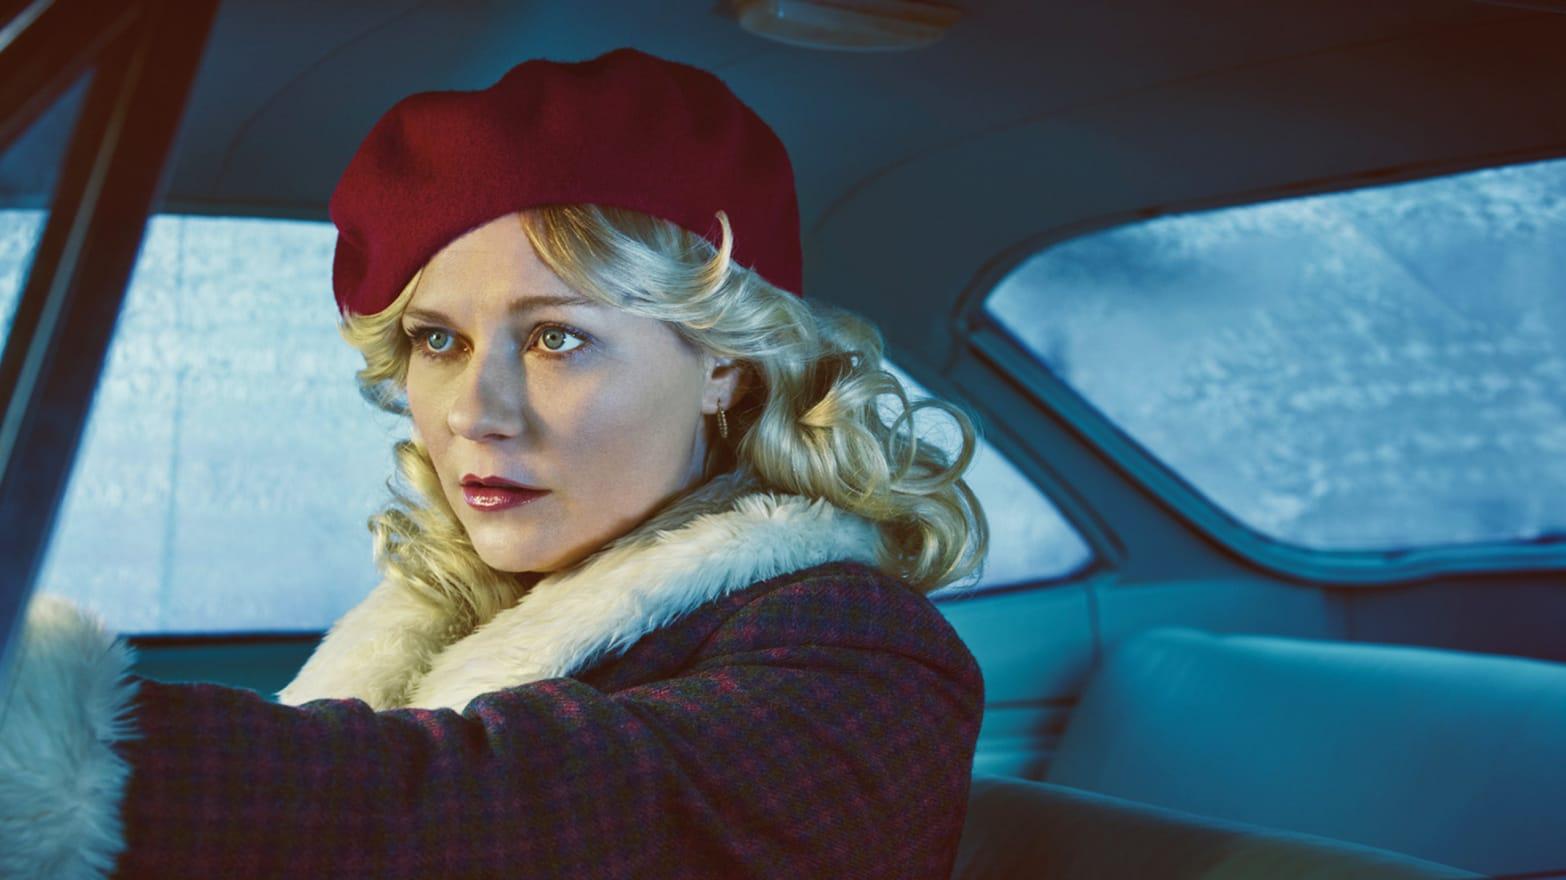 Fargo' Season 2: The Making of a Perfect Show